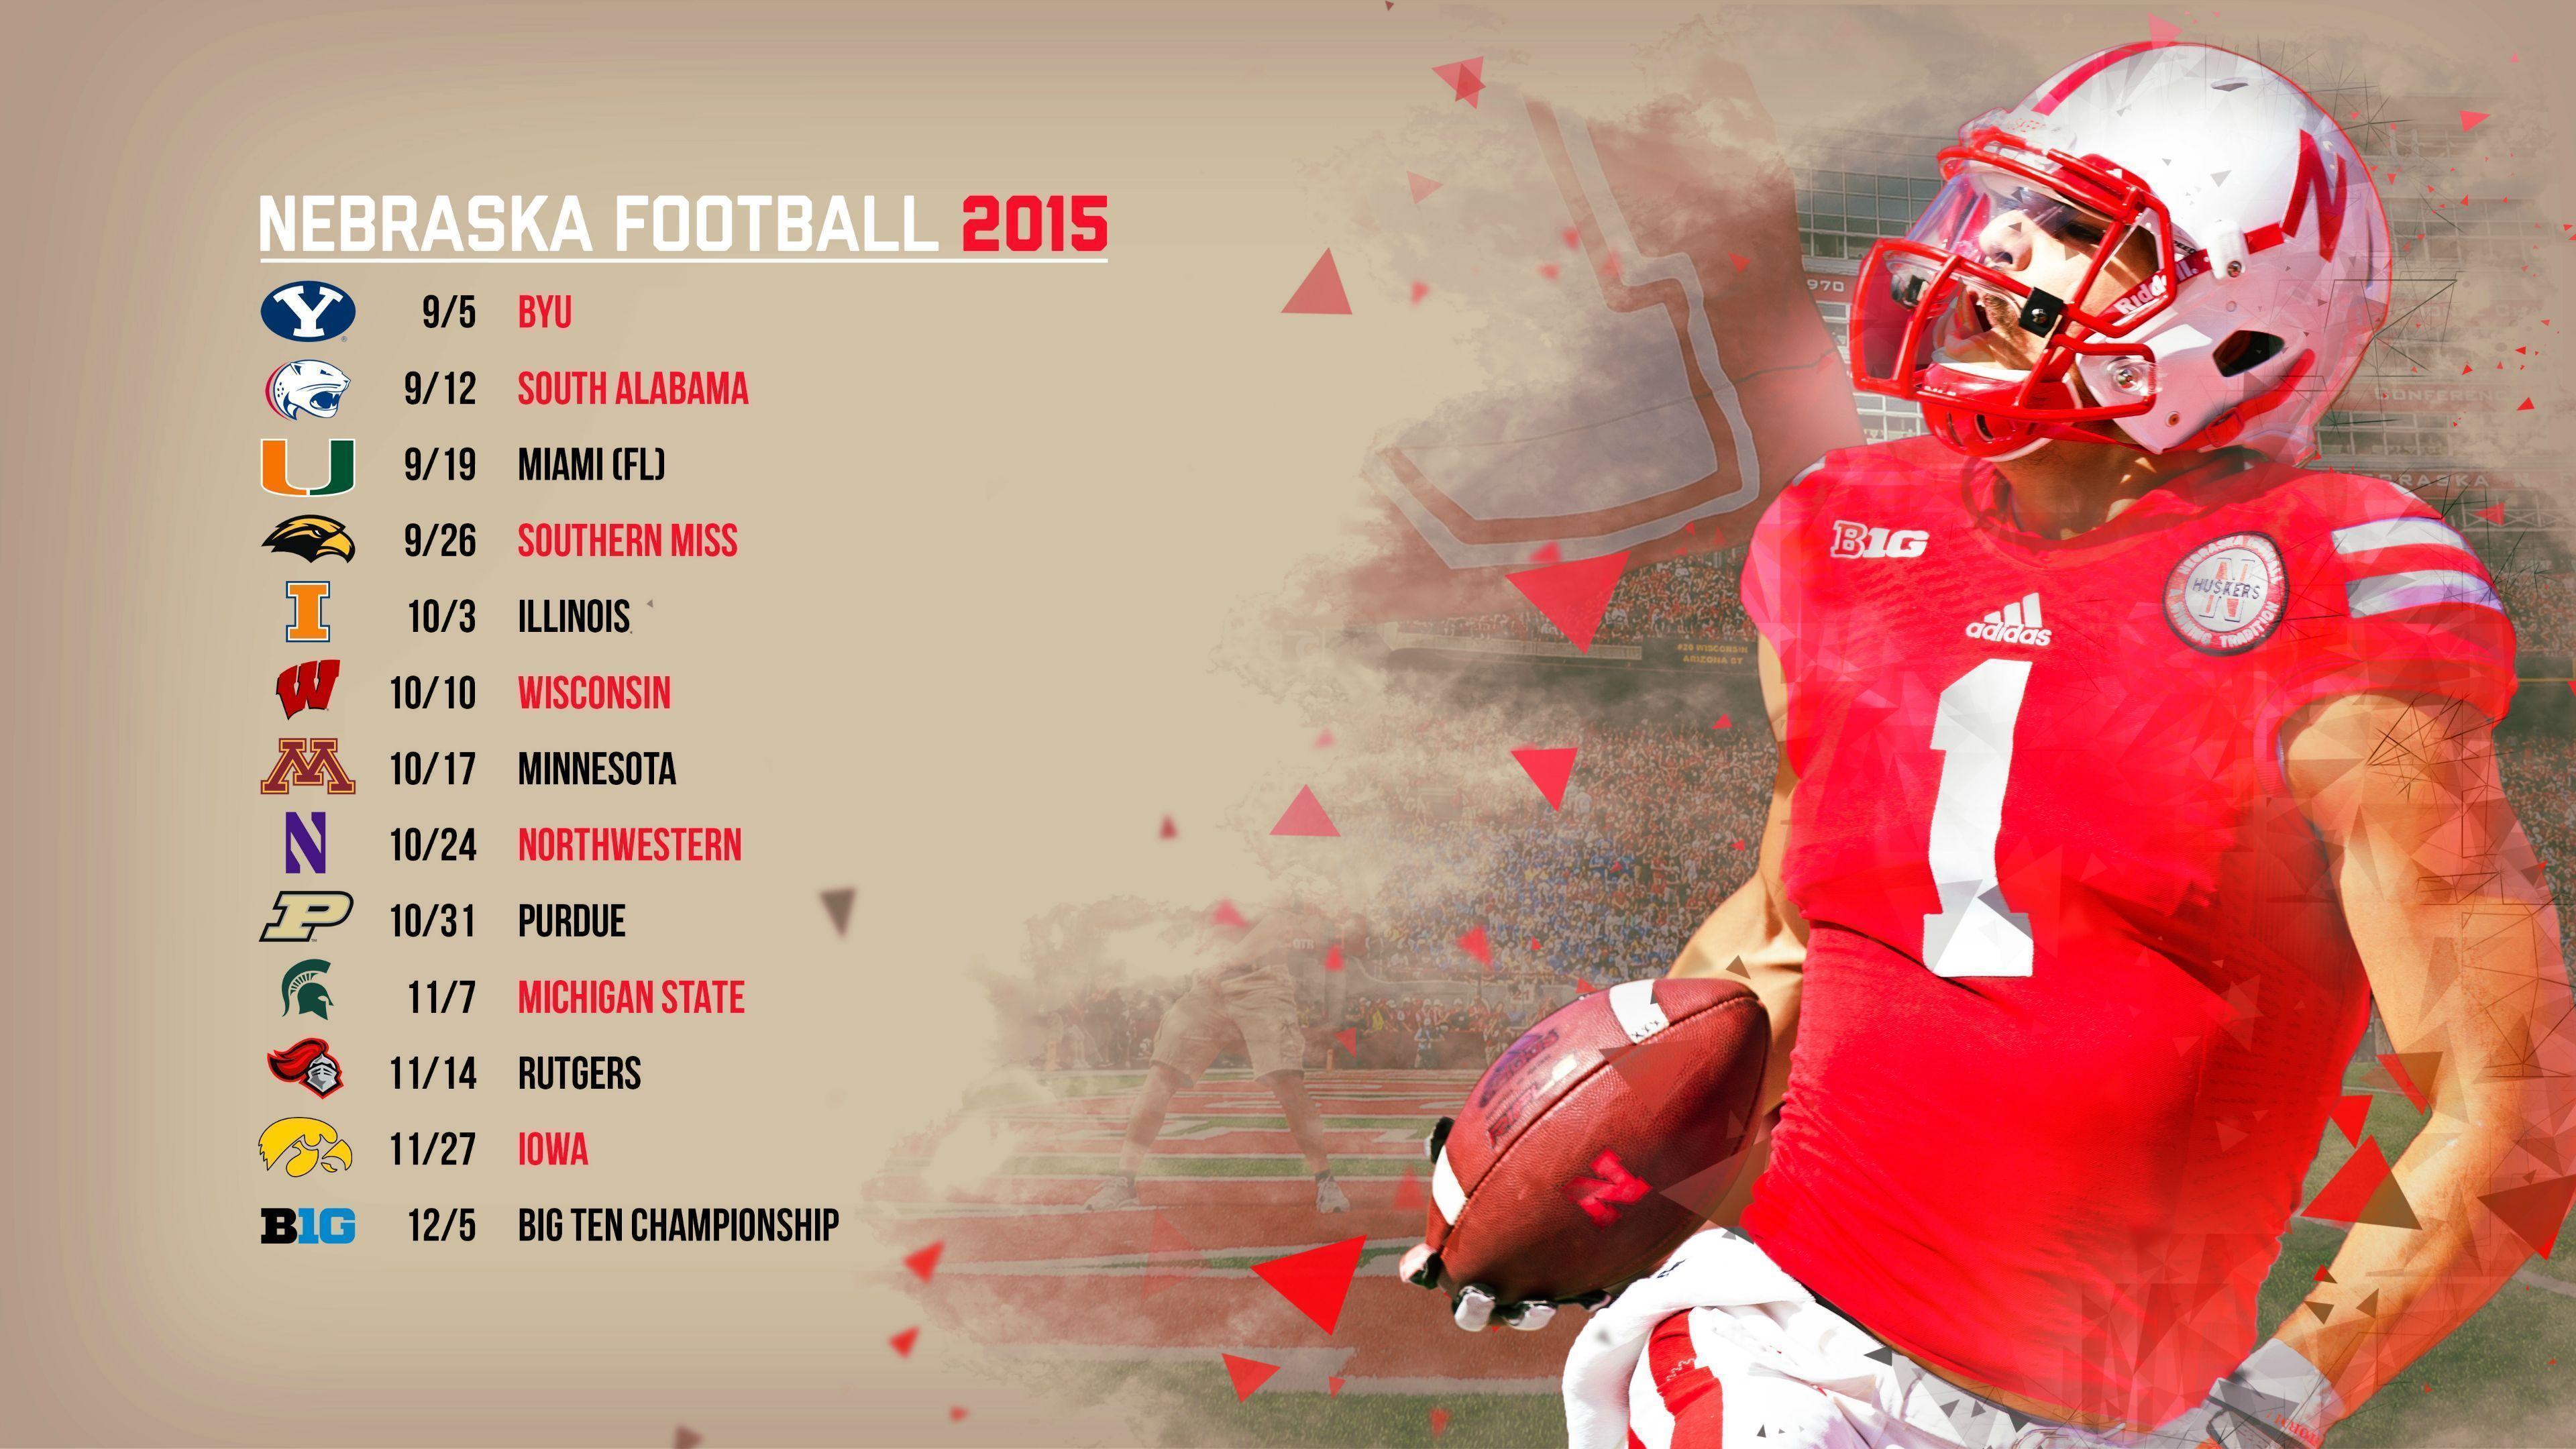 2016 oklahoma university football schedule wallpapers - Nebraska football wallpaper ...